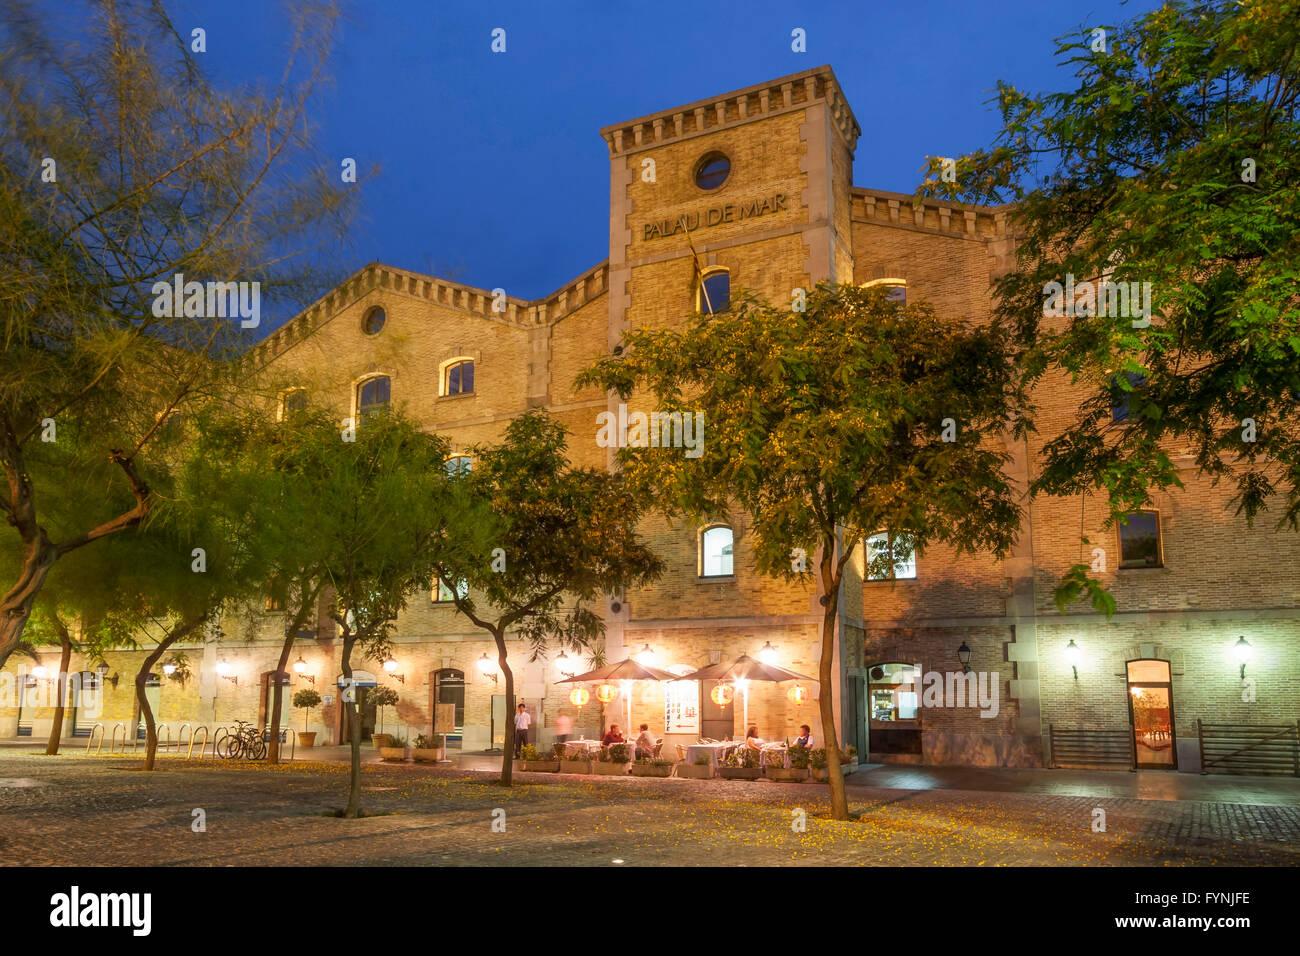 Palau de Mar, Port Architektur s.XIX, Barcelona, Katalonien, Spanien Stockbild